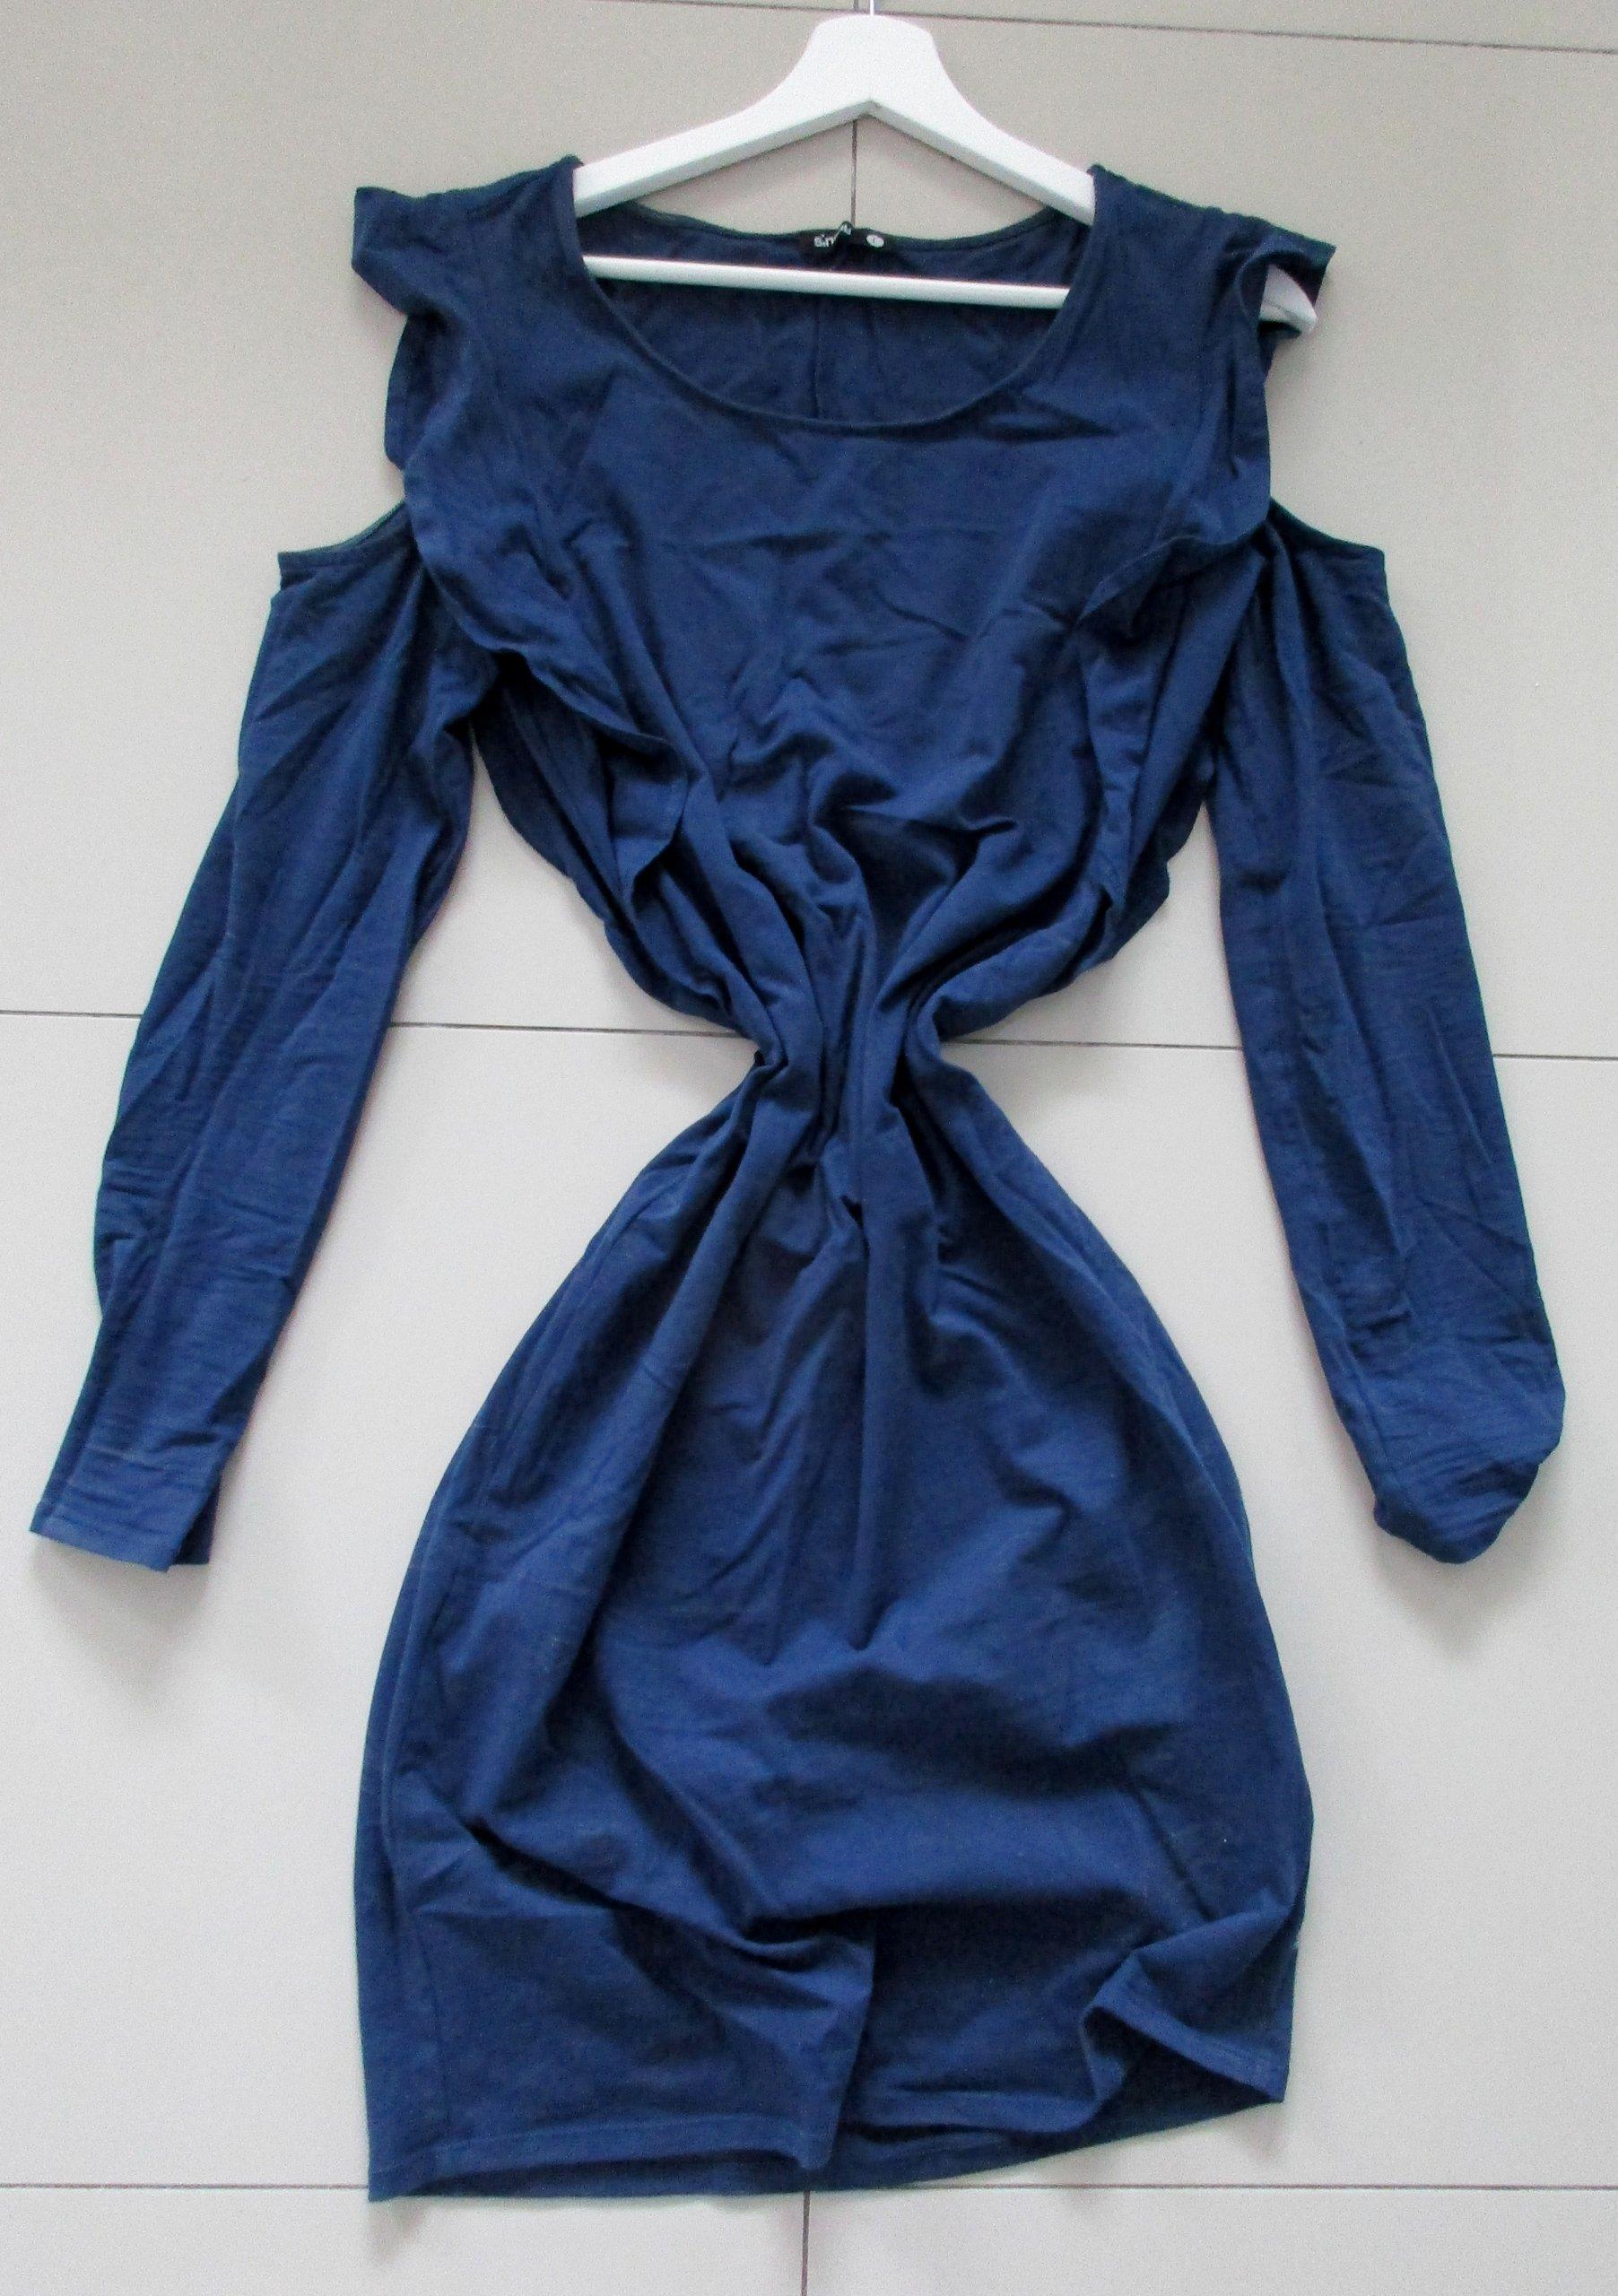 a78c9d99de SINSAY Granatowa Sukienka Odkryte Ramiona 42 XL - 7253451562 ...